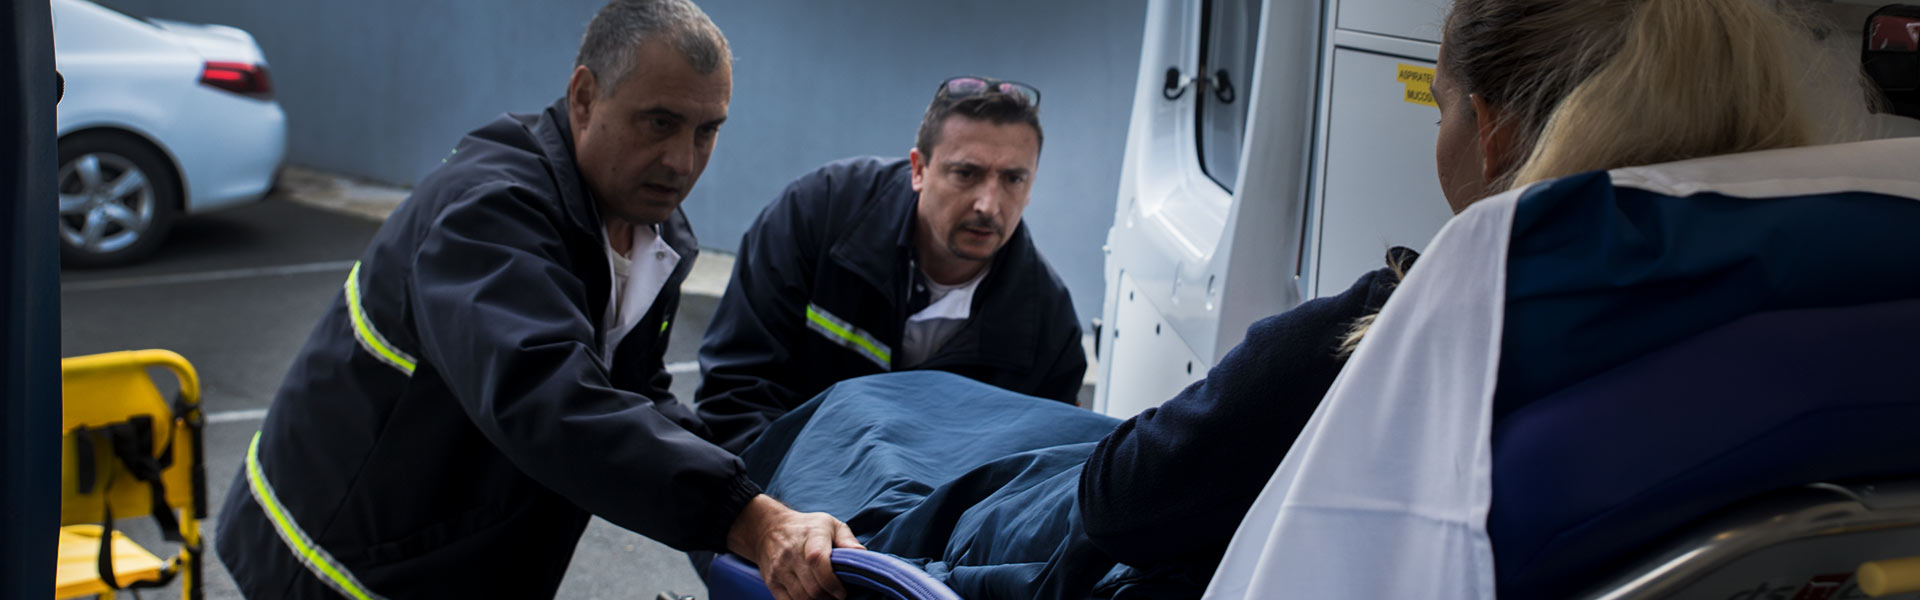 Ambulance-Azur-castres-03